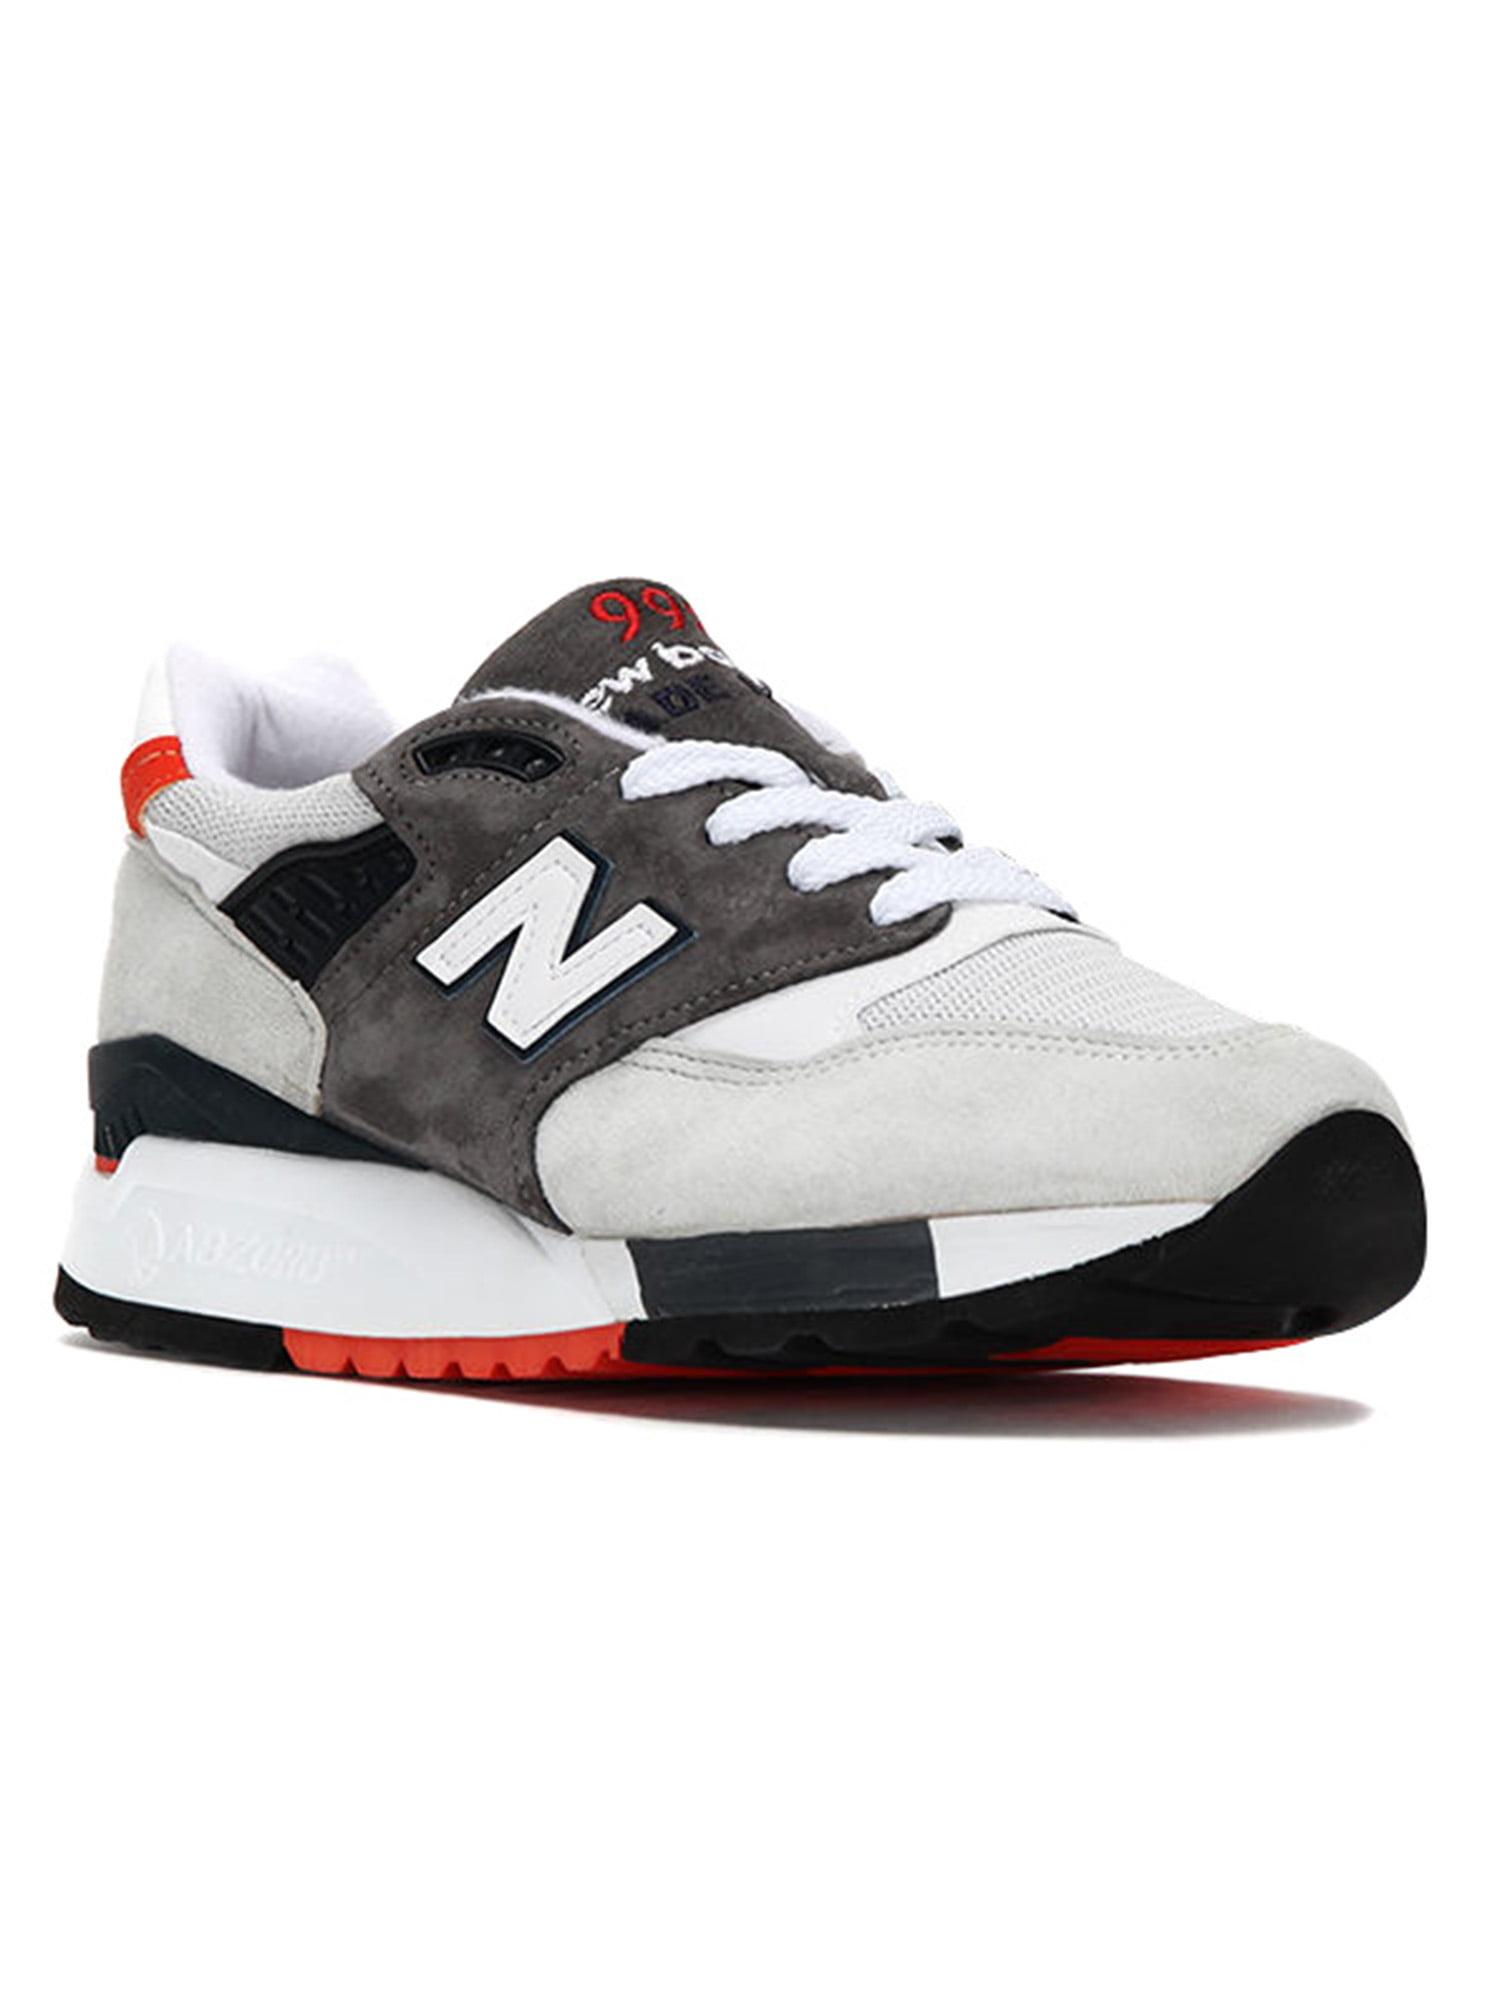 New Balance Men's 998 Explore By Air Sneakers M998CREA Grey Black Orange by